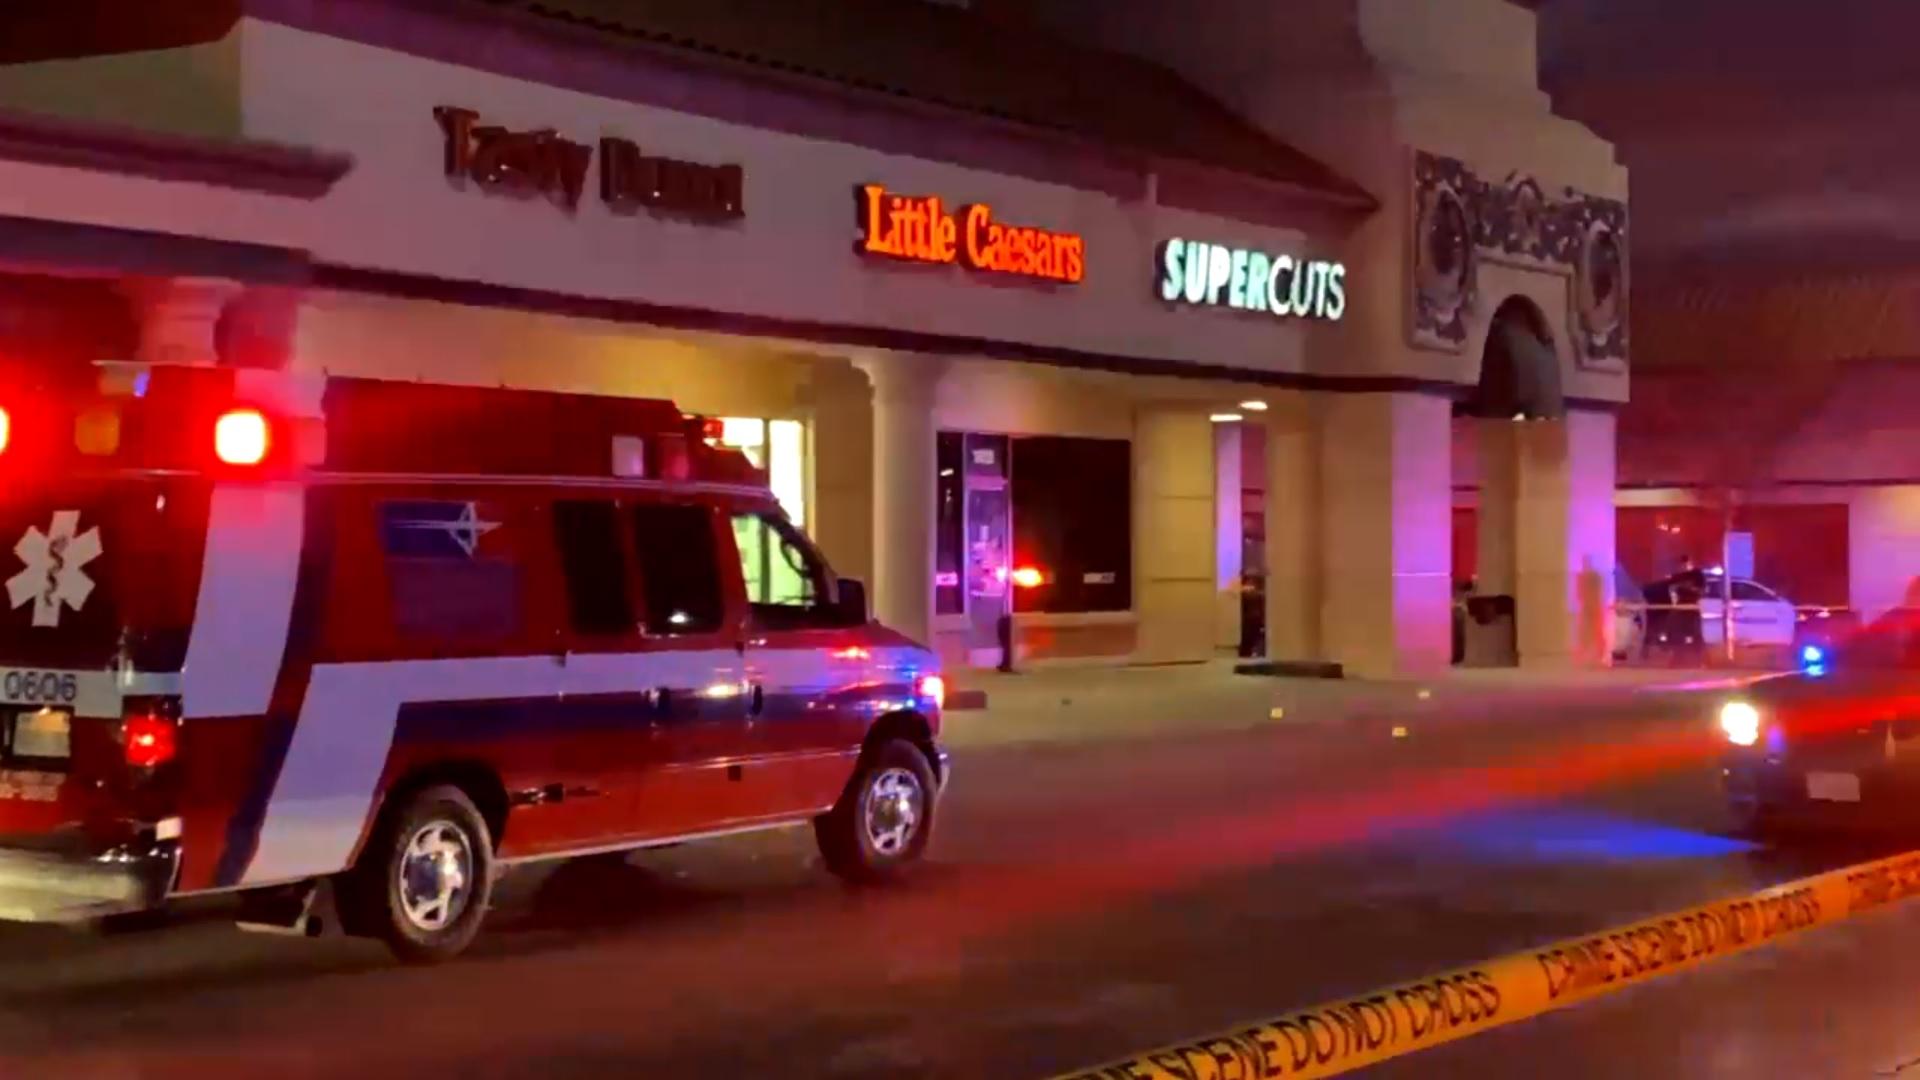 3 hit in shooting at Visalia Little Caesars, police say